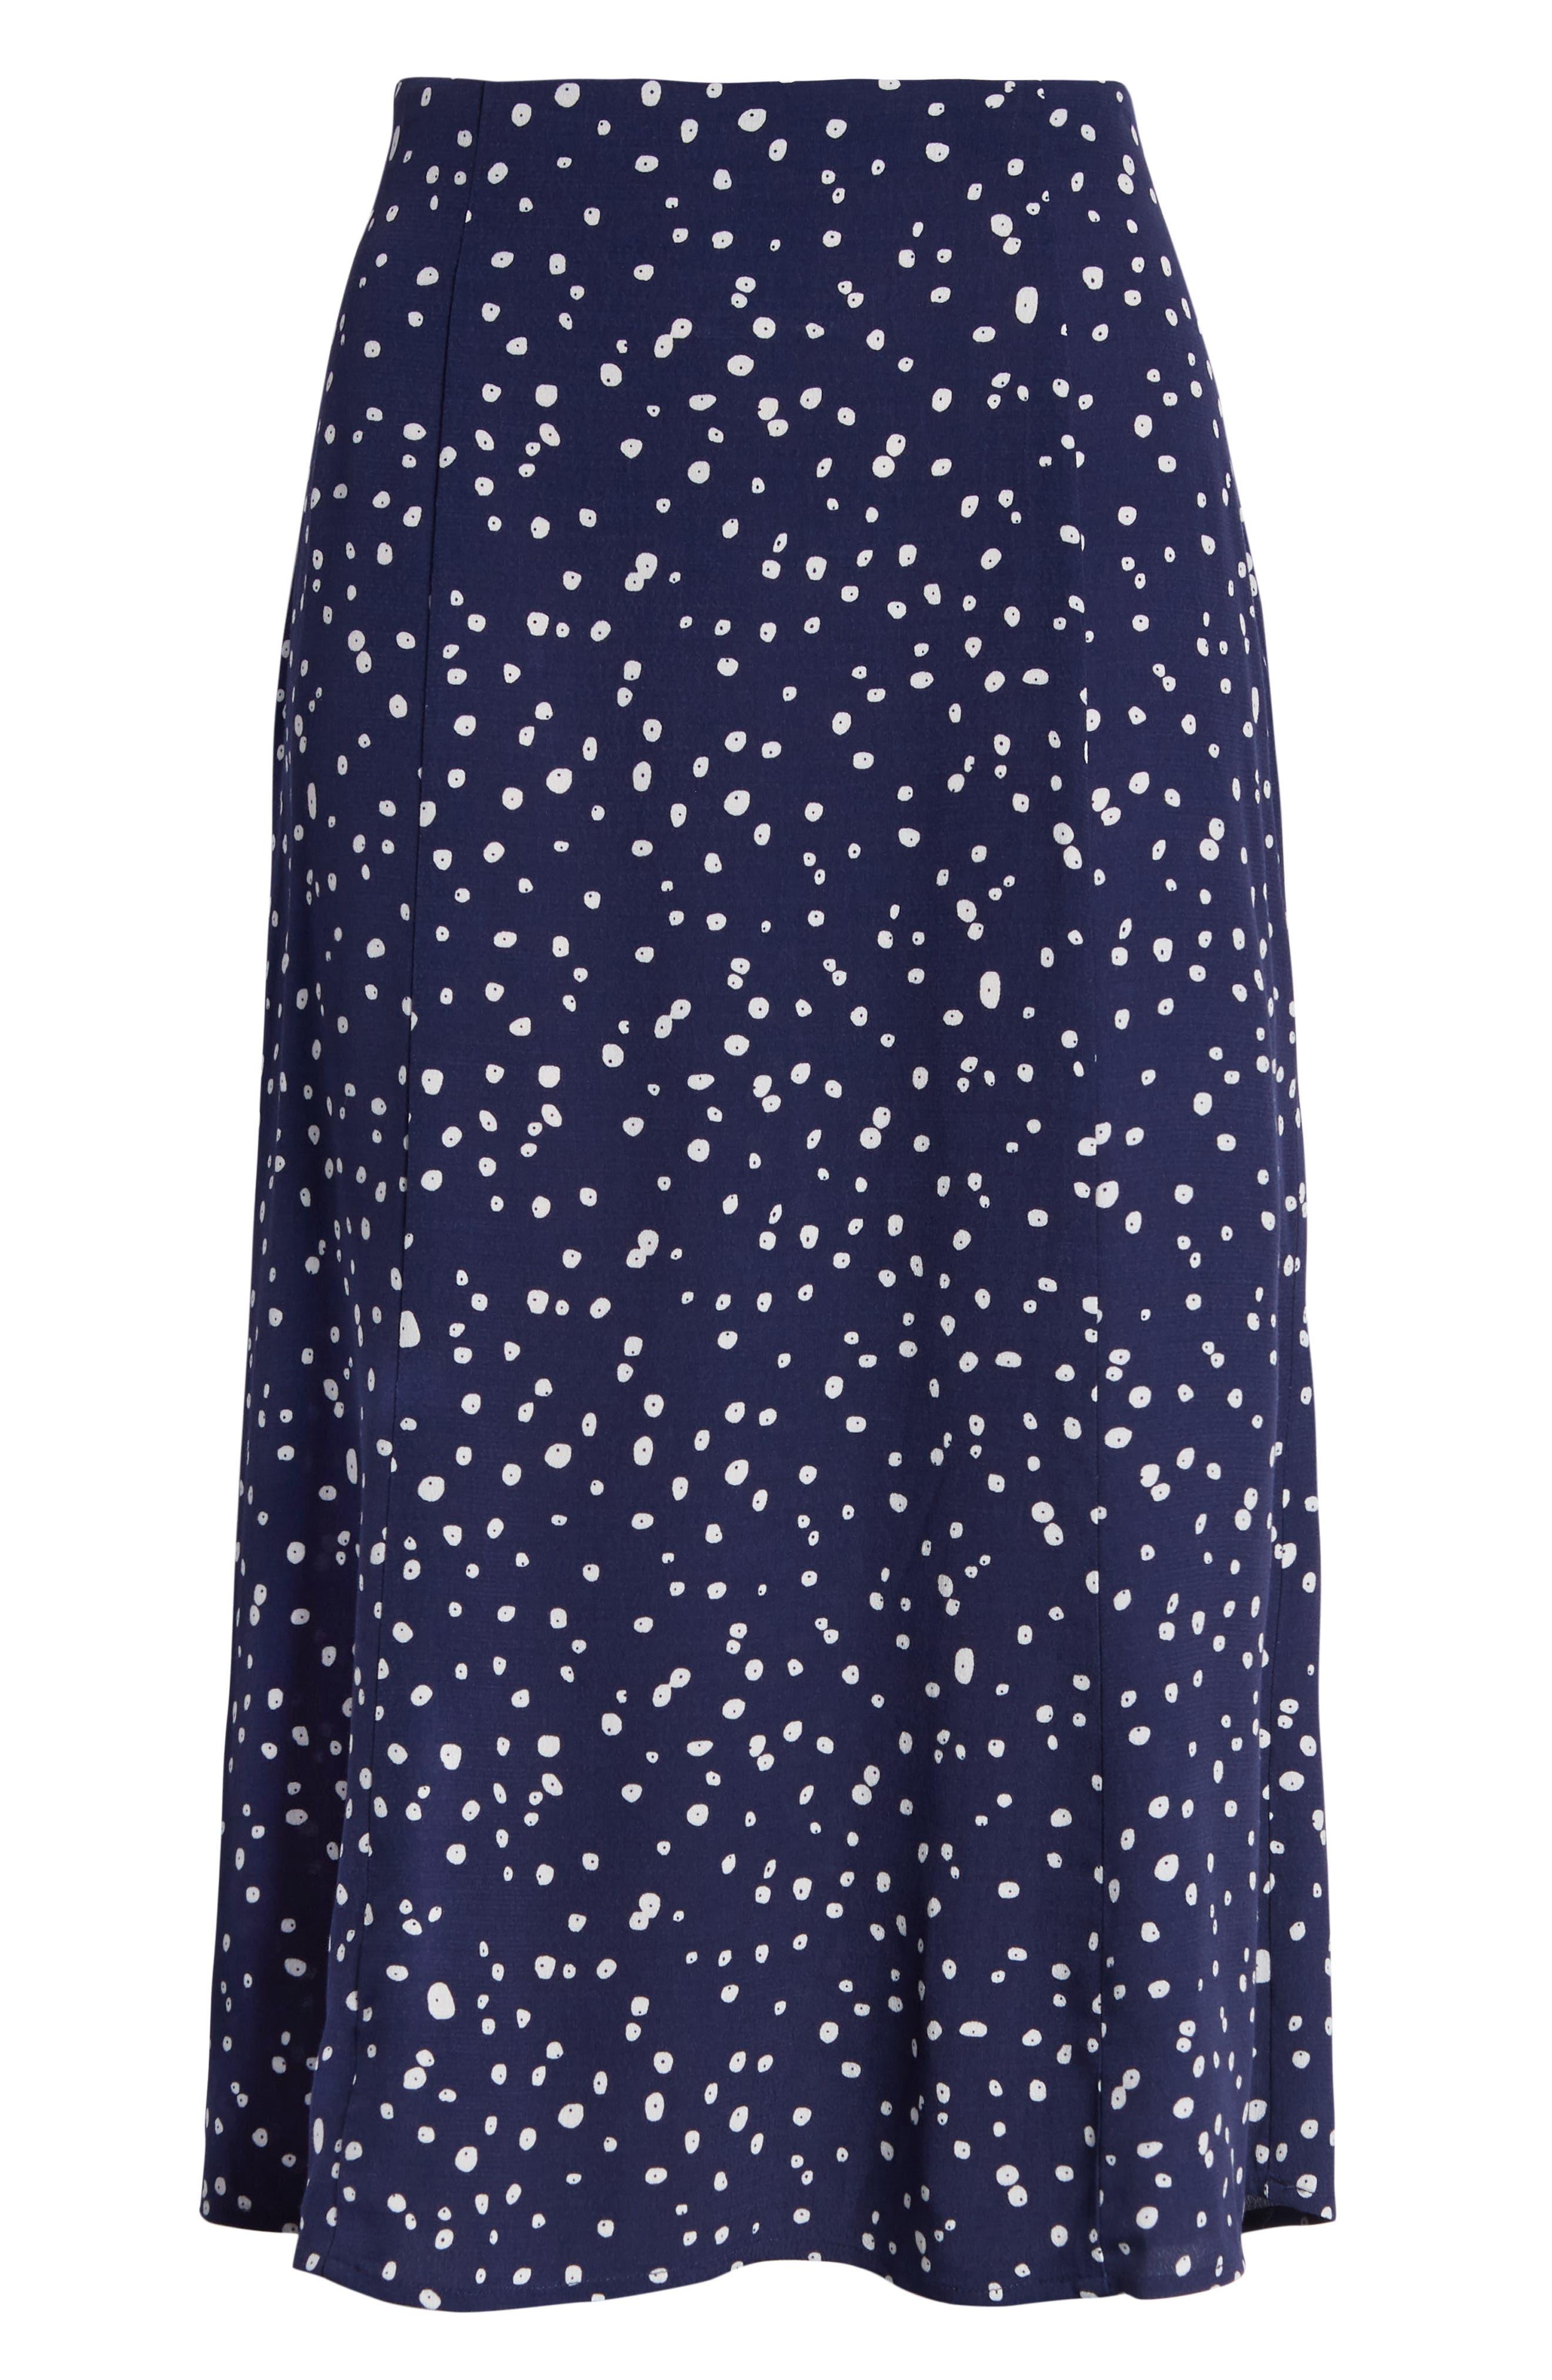 LEITH,                             High Waist Print Midi Skirt,                             Alternate thumbnail 6, color,                             NAVY PEACOAT BUTTON DOTS